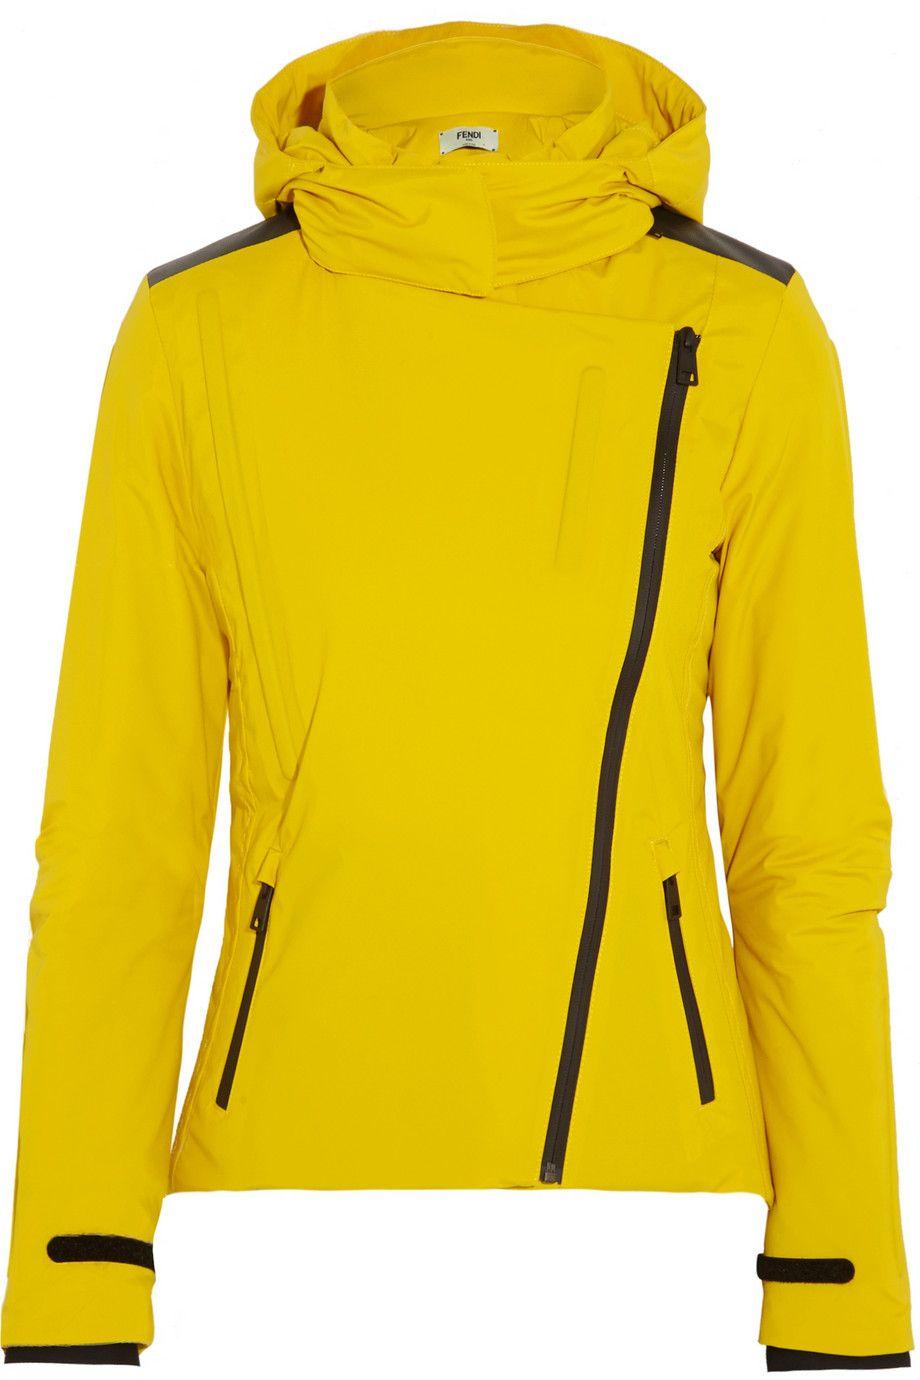 Fendi Hooded twill ski jacket Ski jacket, Jackets